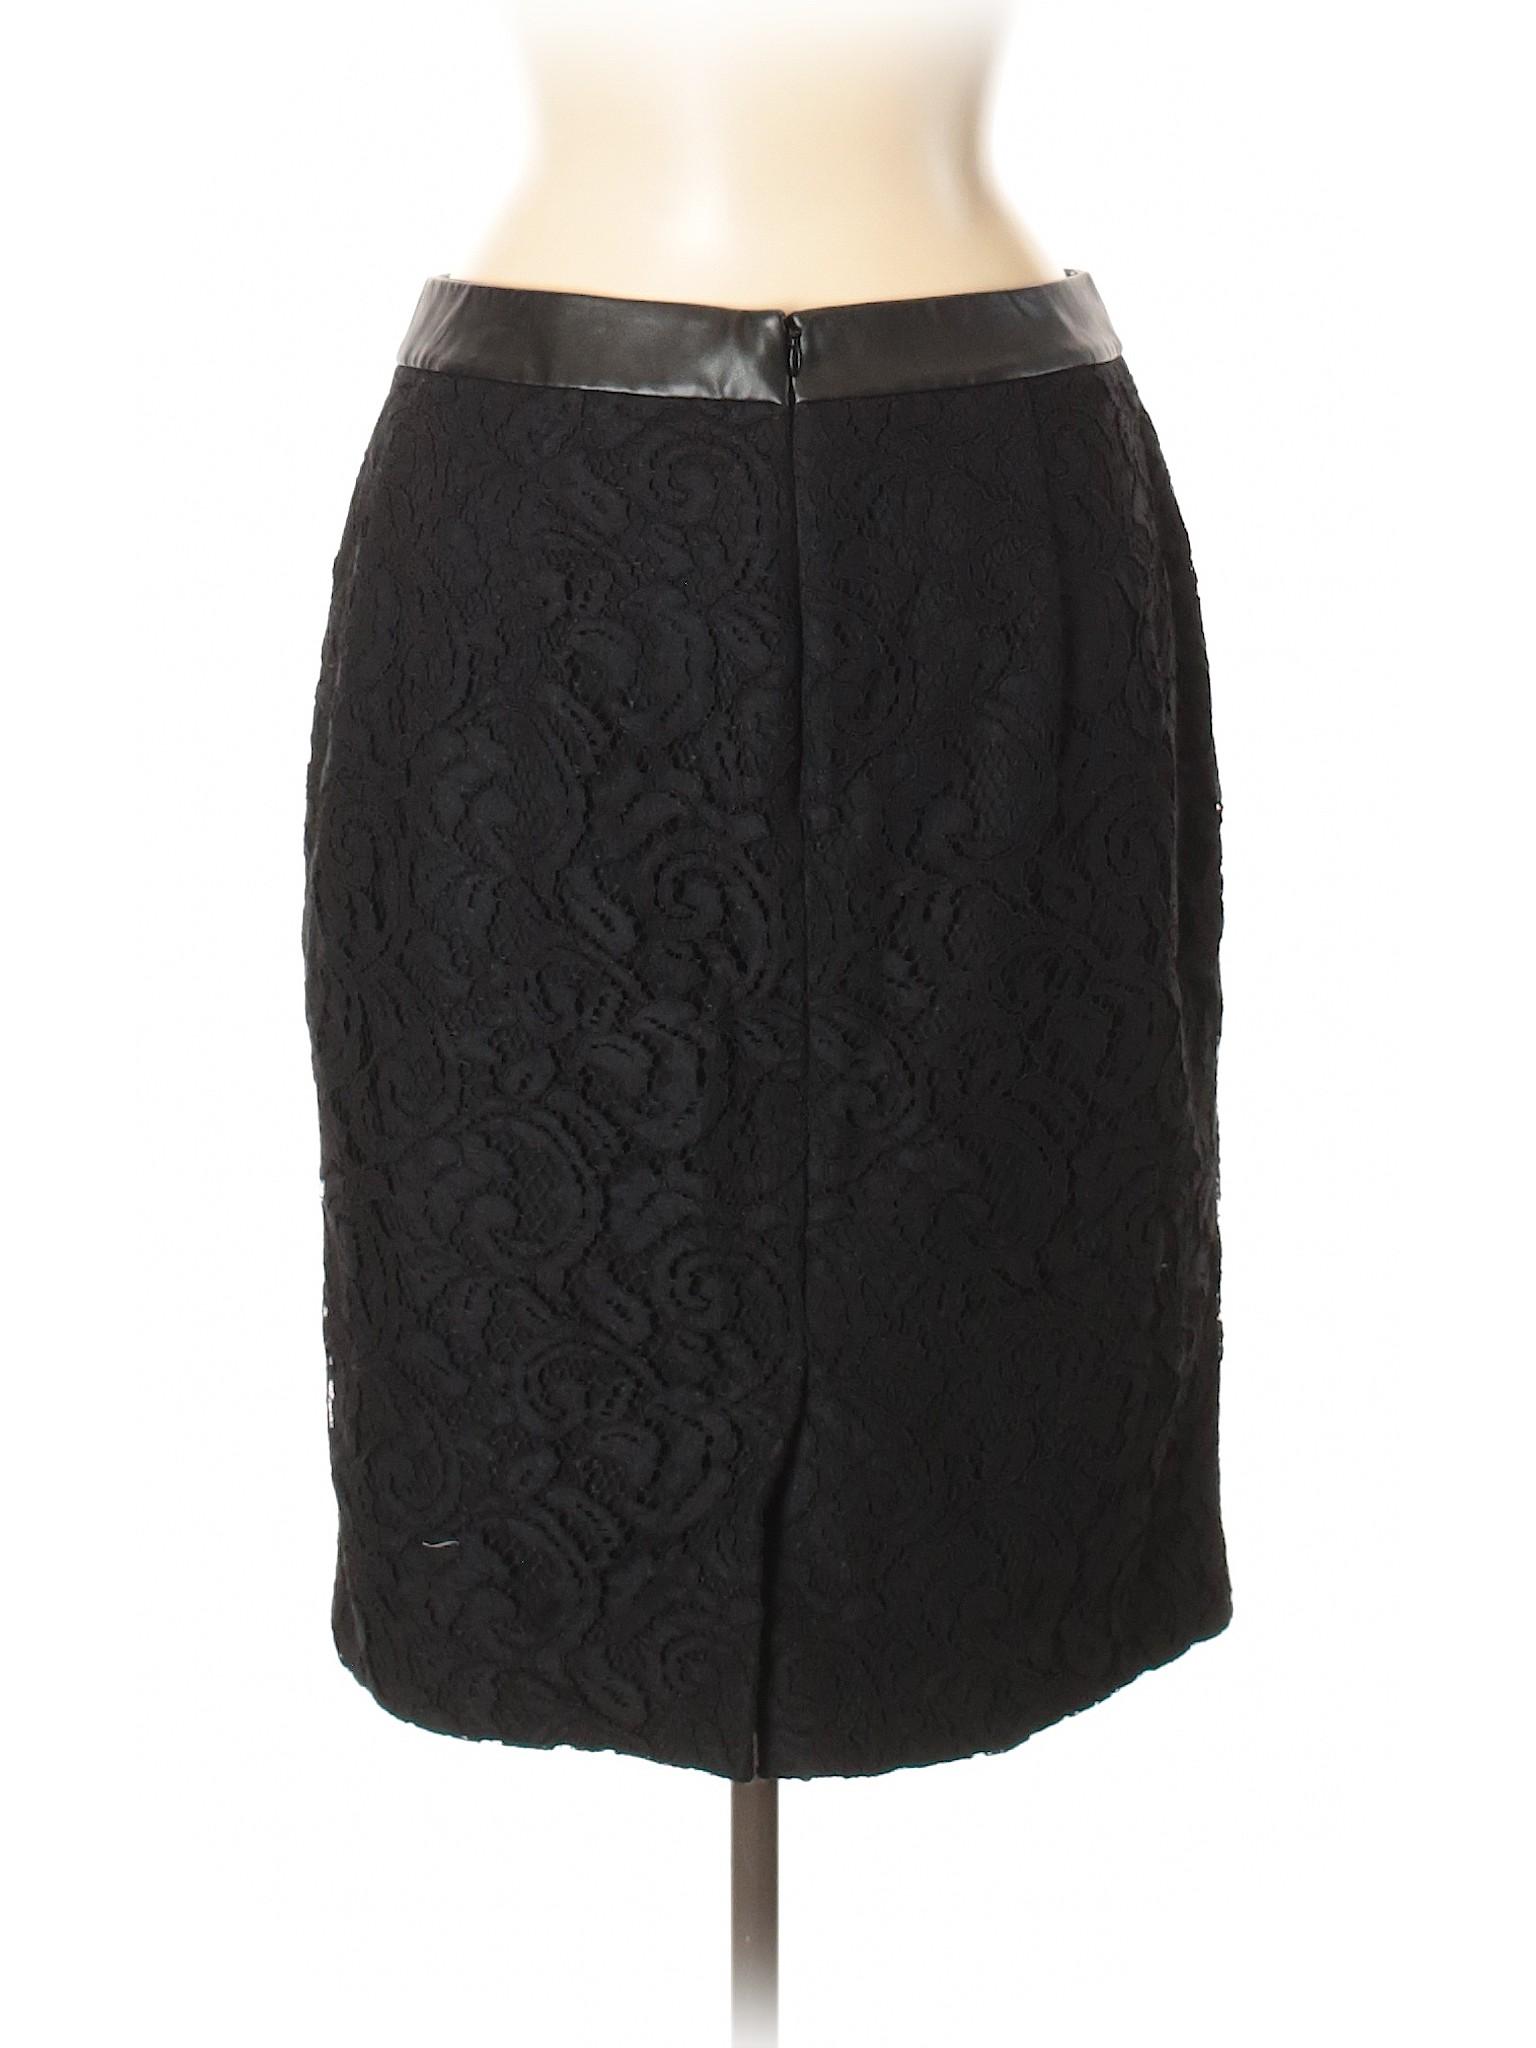 Skirt Boutique Skirt Casual Skirt Casual Boutique Boutique Casual qZ4xB0